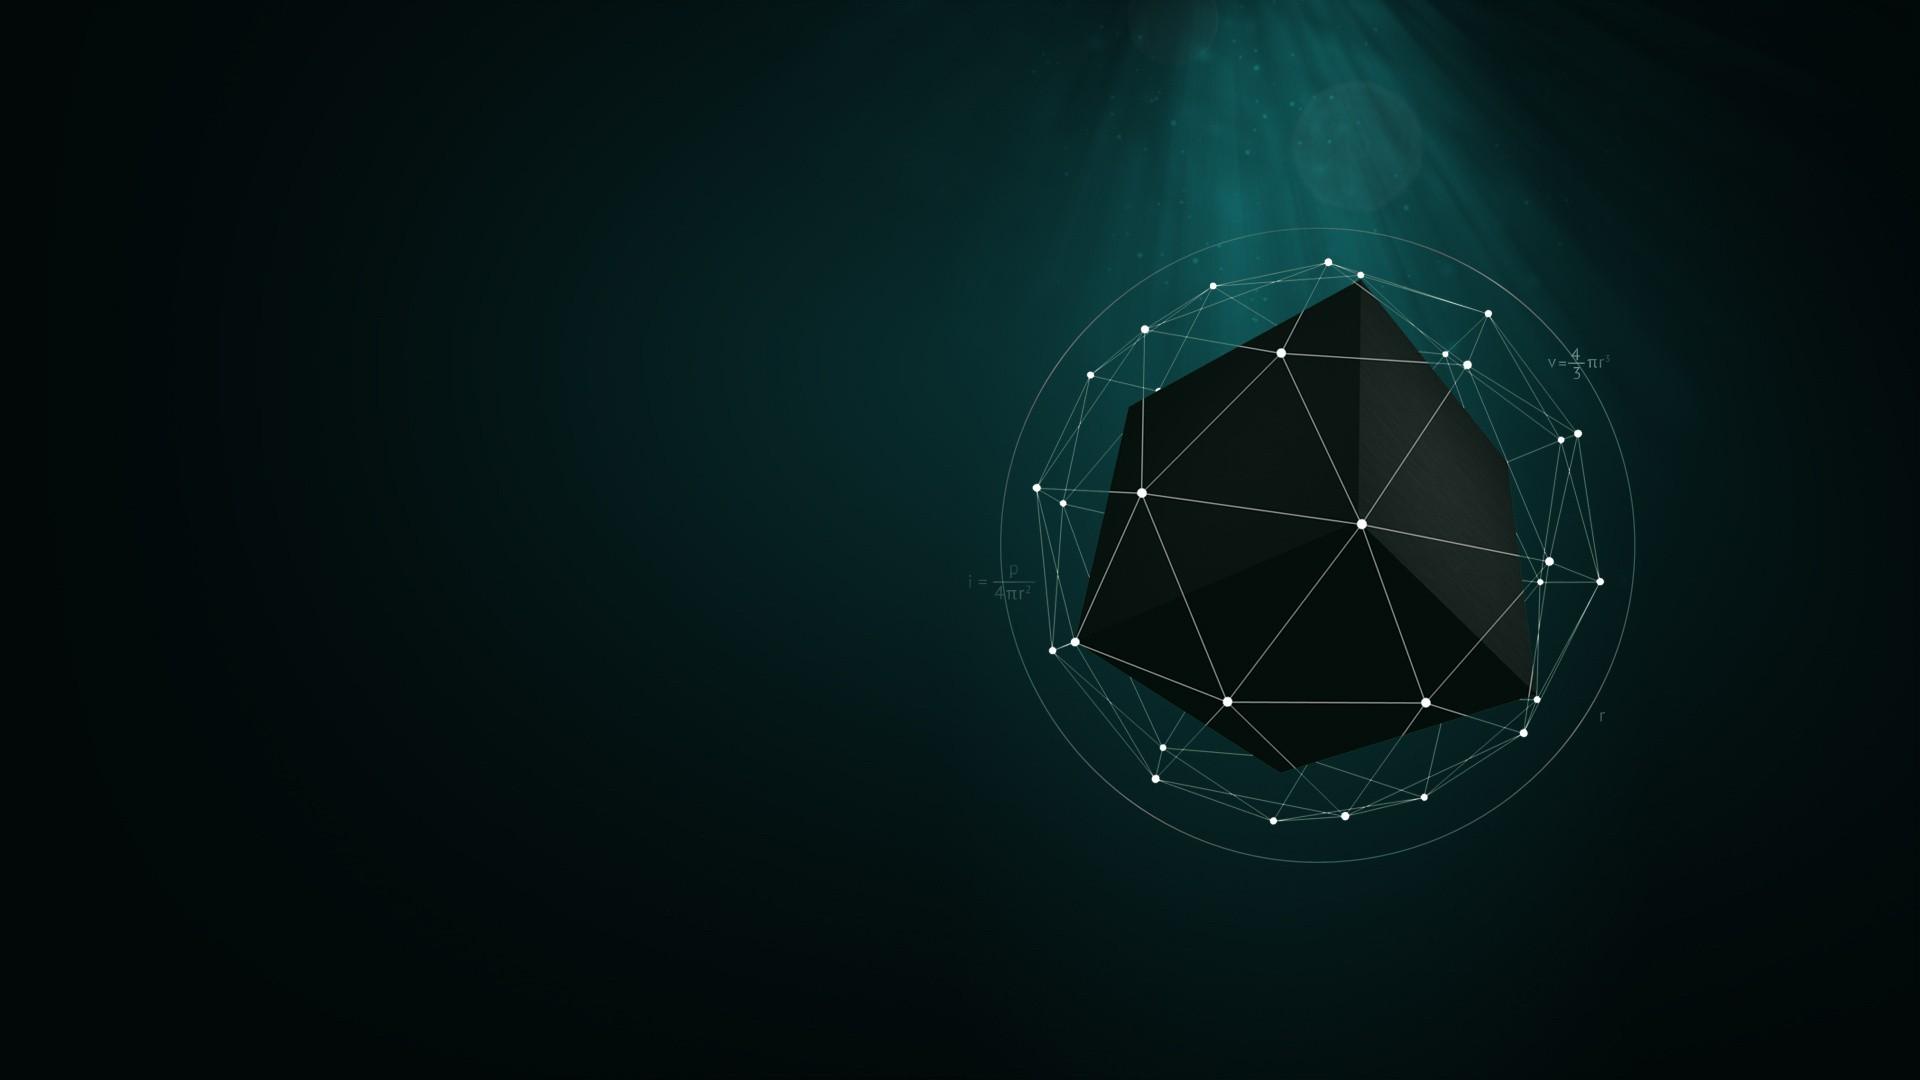 Geometric Wallpaper 3